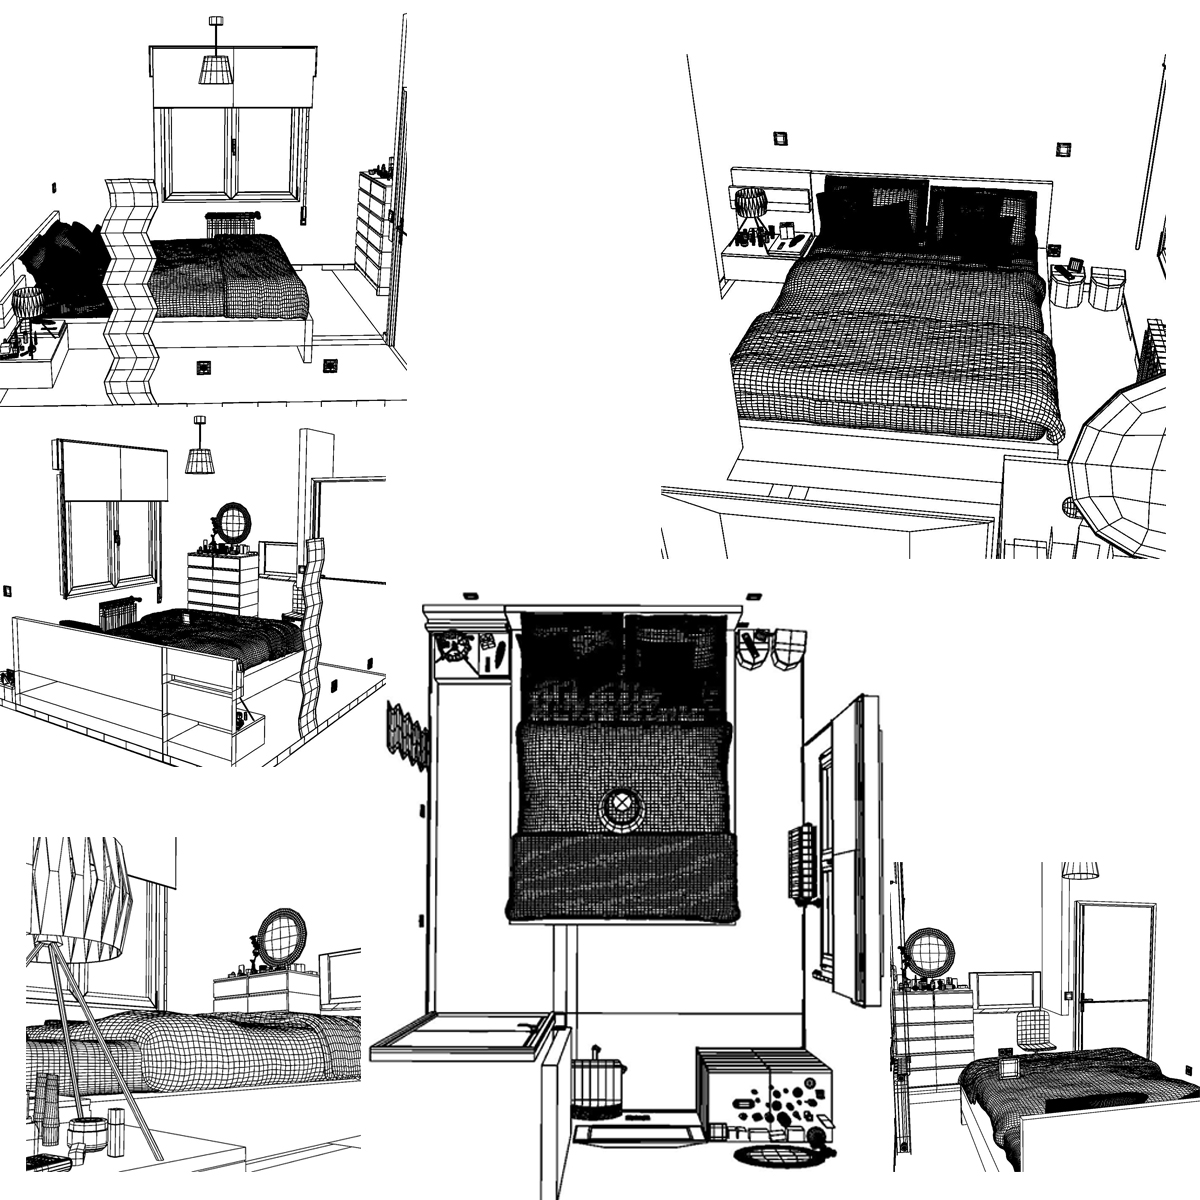 guļamistaba 8 3d modelis 3ds max fbx c4d ma mb obj 159566